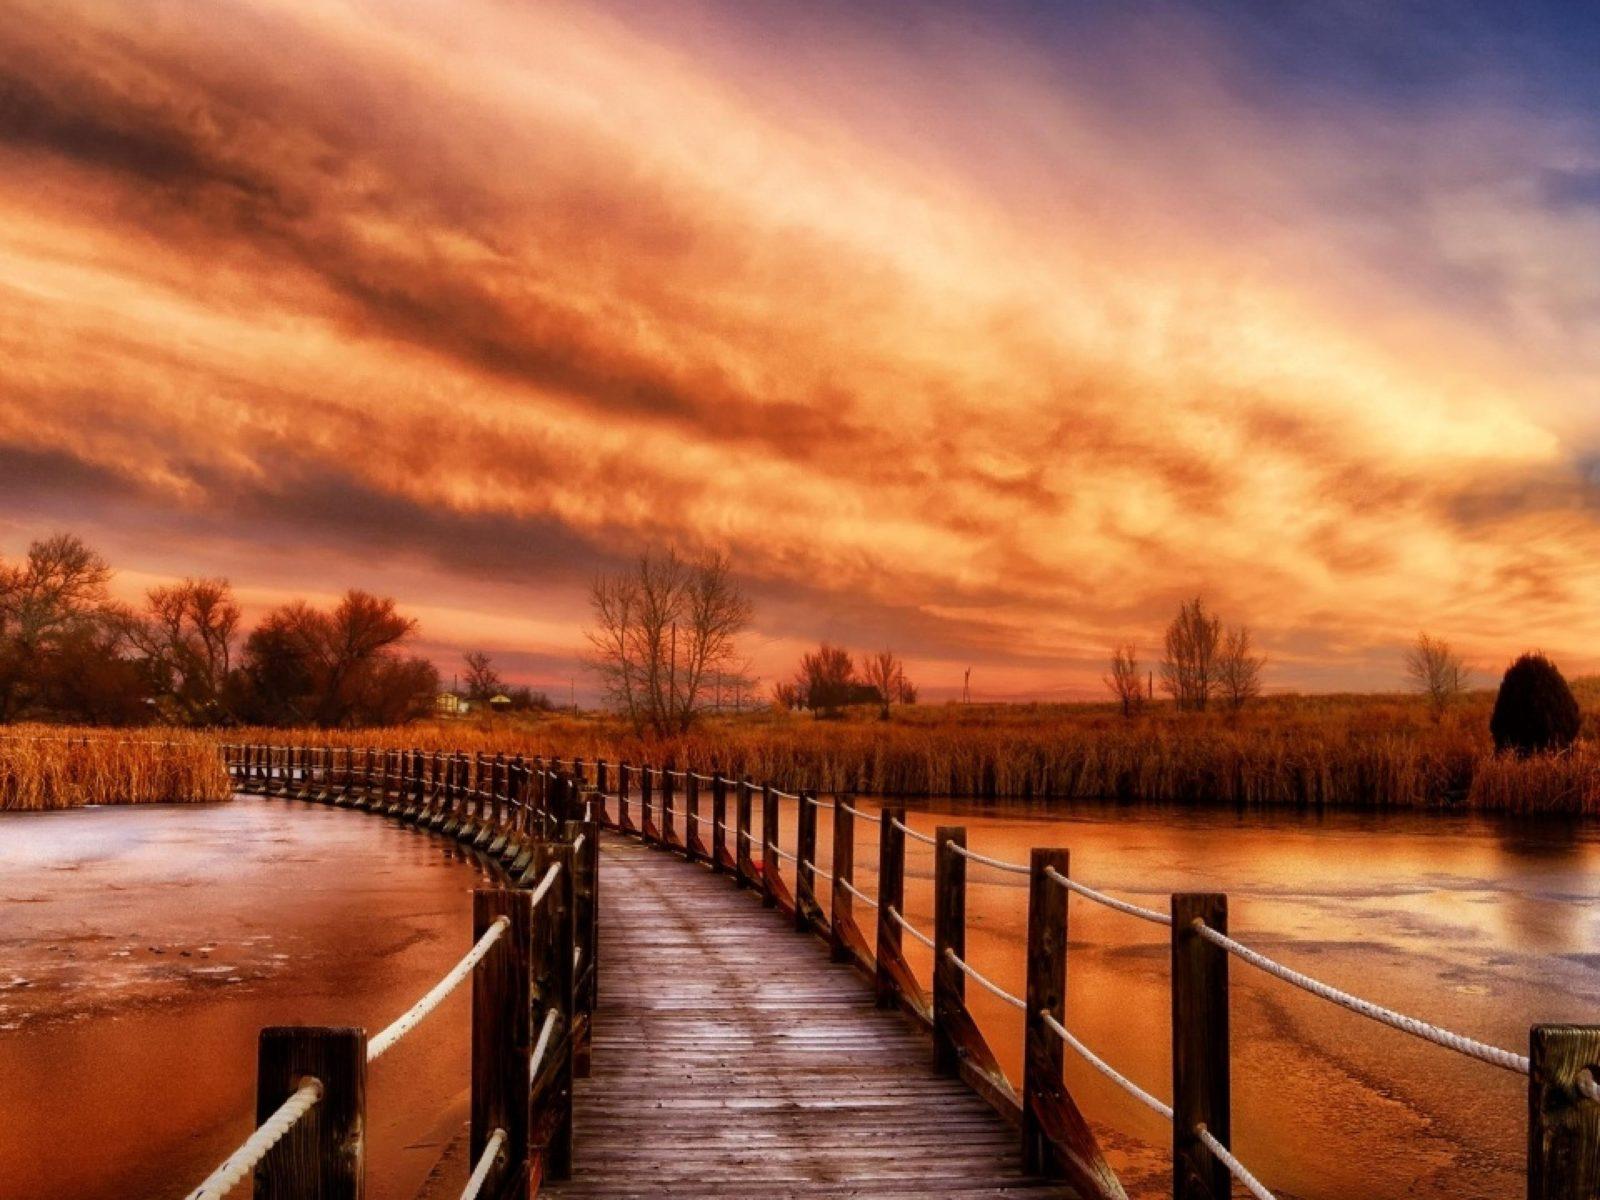 Hd Fall Wallpap Autumn River Sky Wooden Bridge Ultra Hd 3840x2160